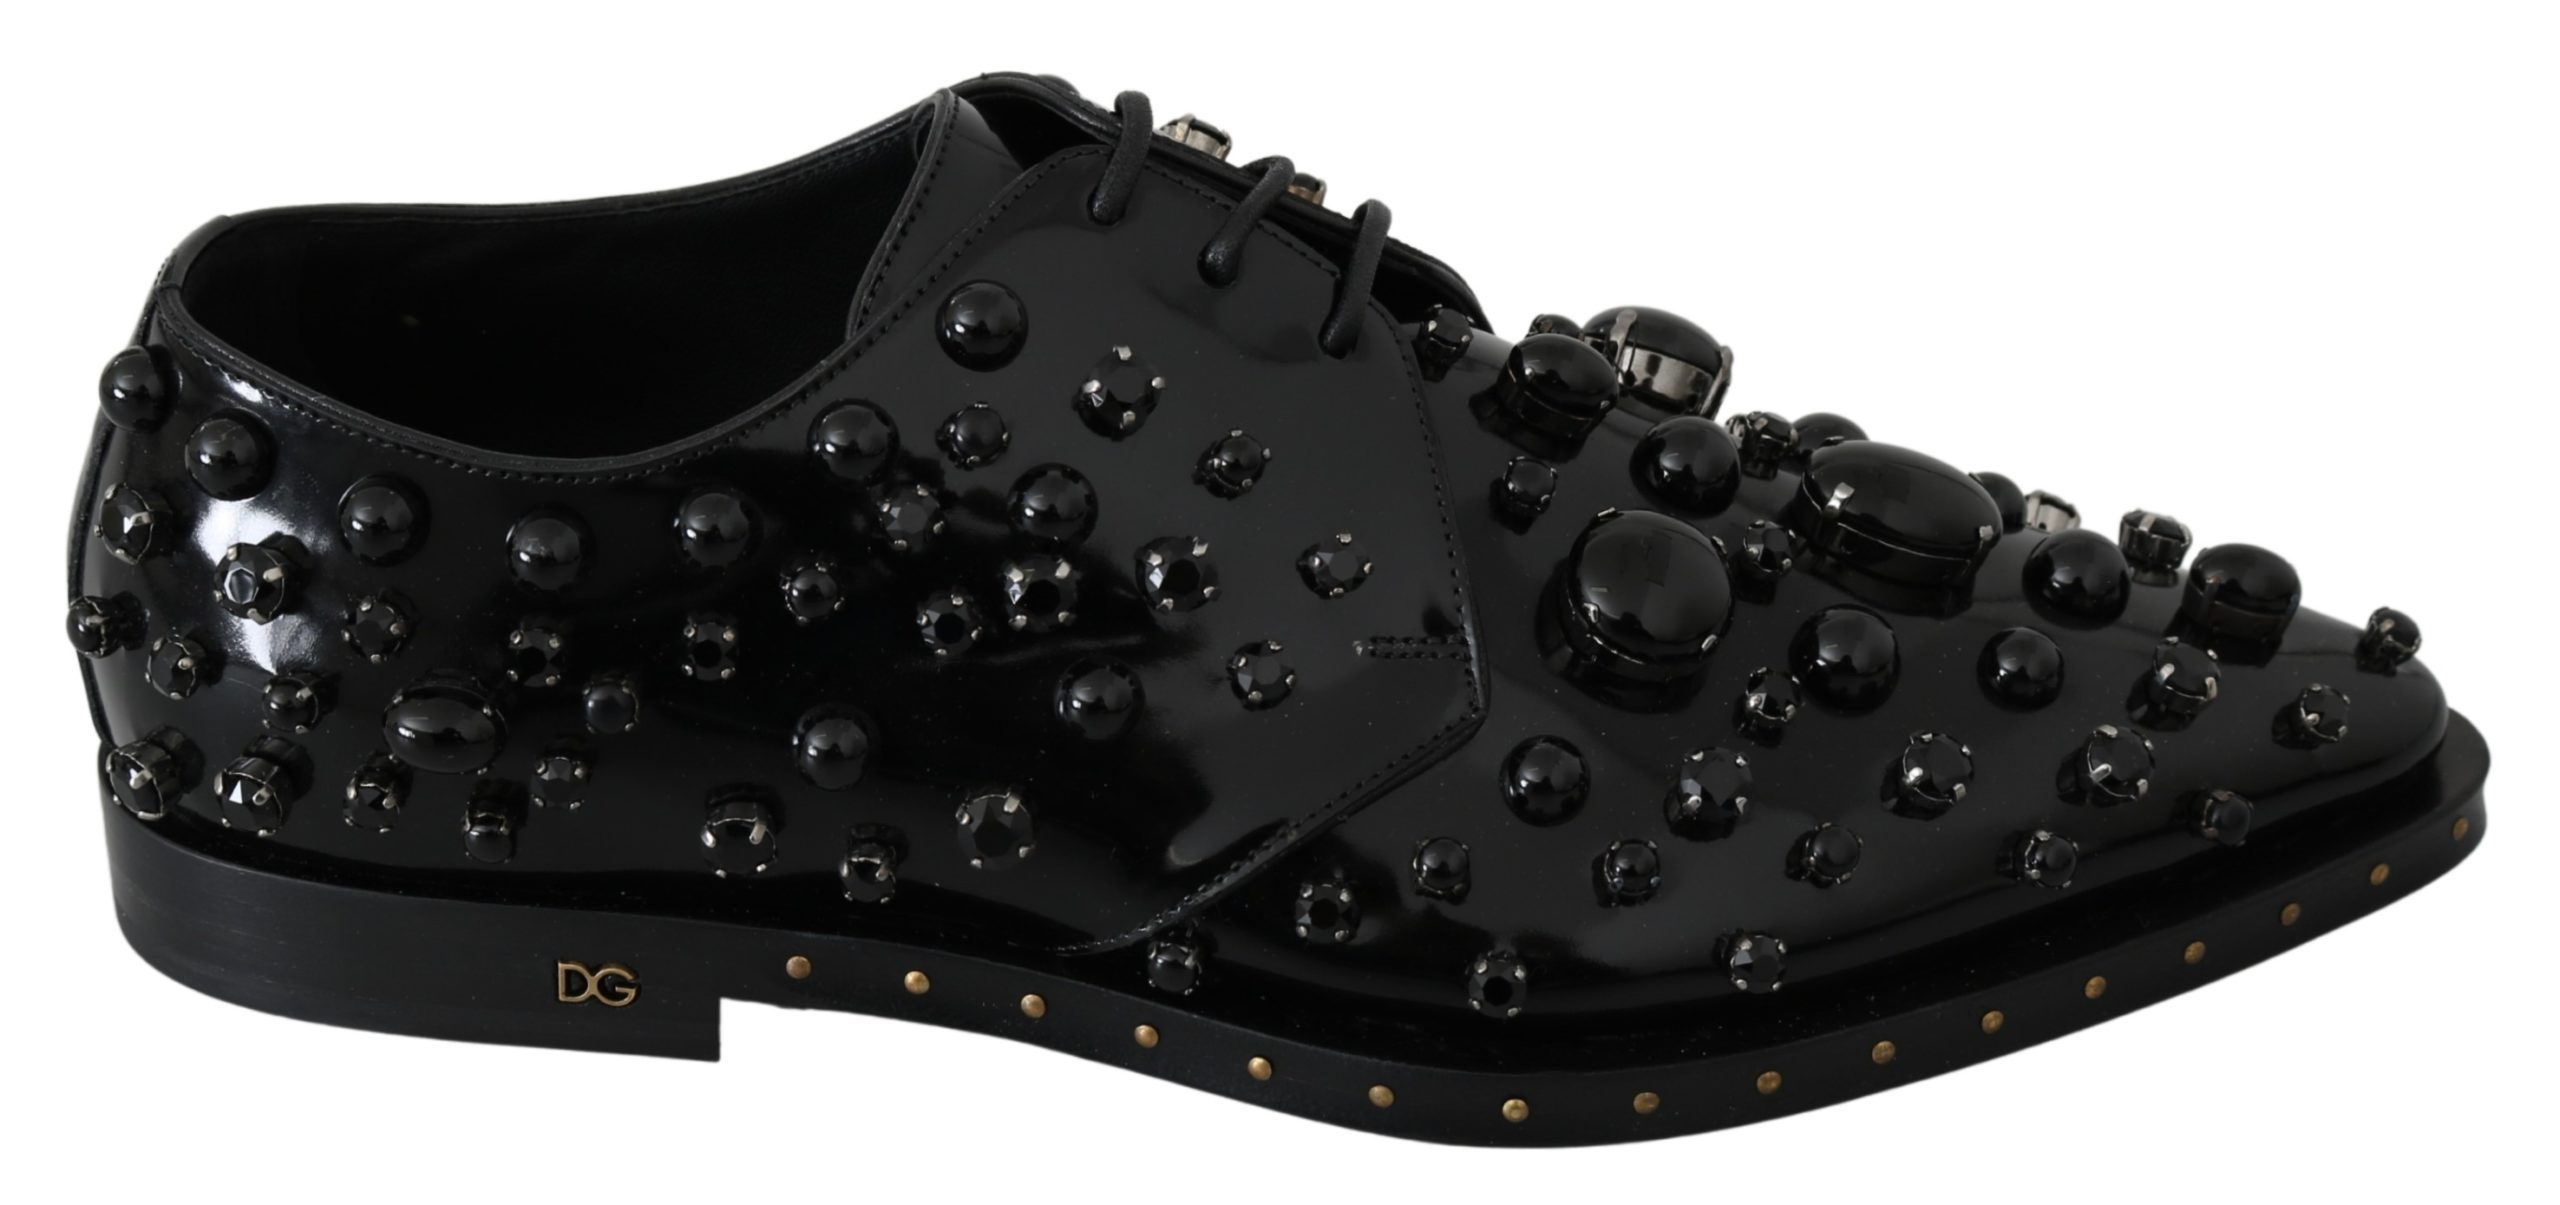 Dolce & Gabbana Women's Crystals Dress Broque Shoe Black Black LA7210 - EU39/US8.5